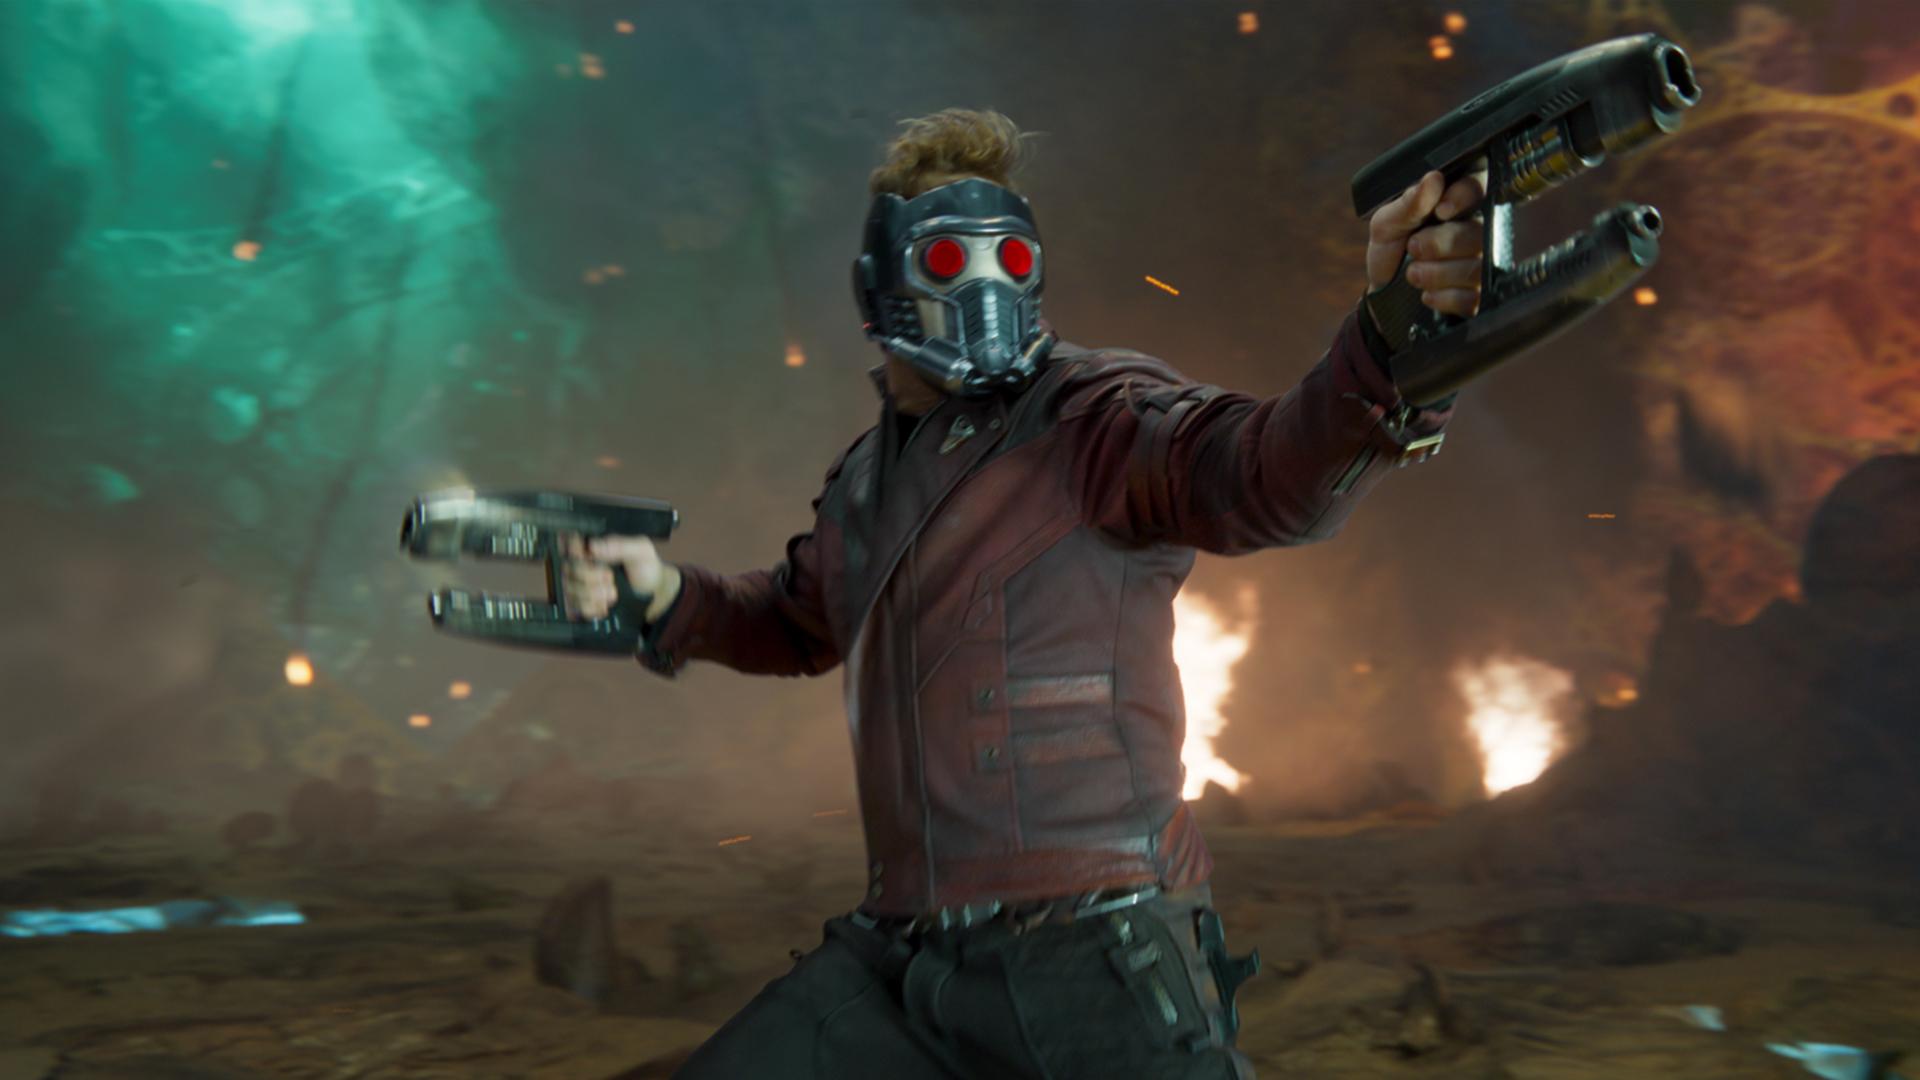 Guardians of the Galaxy Vol 2 Marvel Entertainment Chris Pratt Star Lord